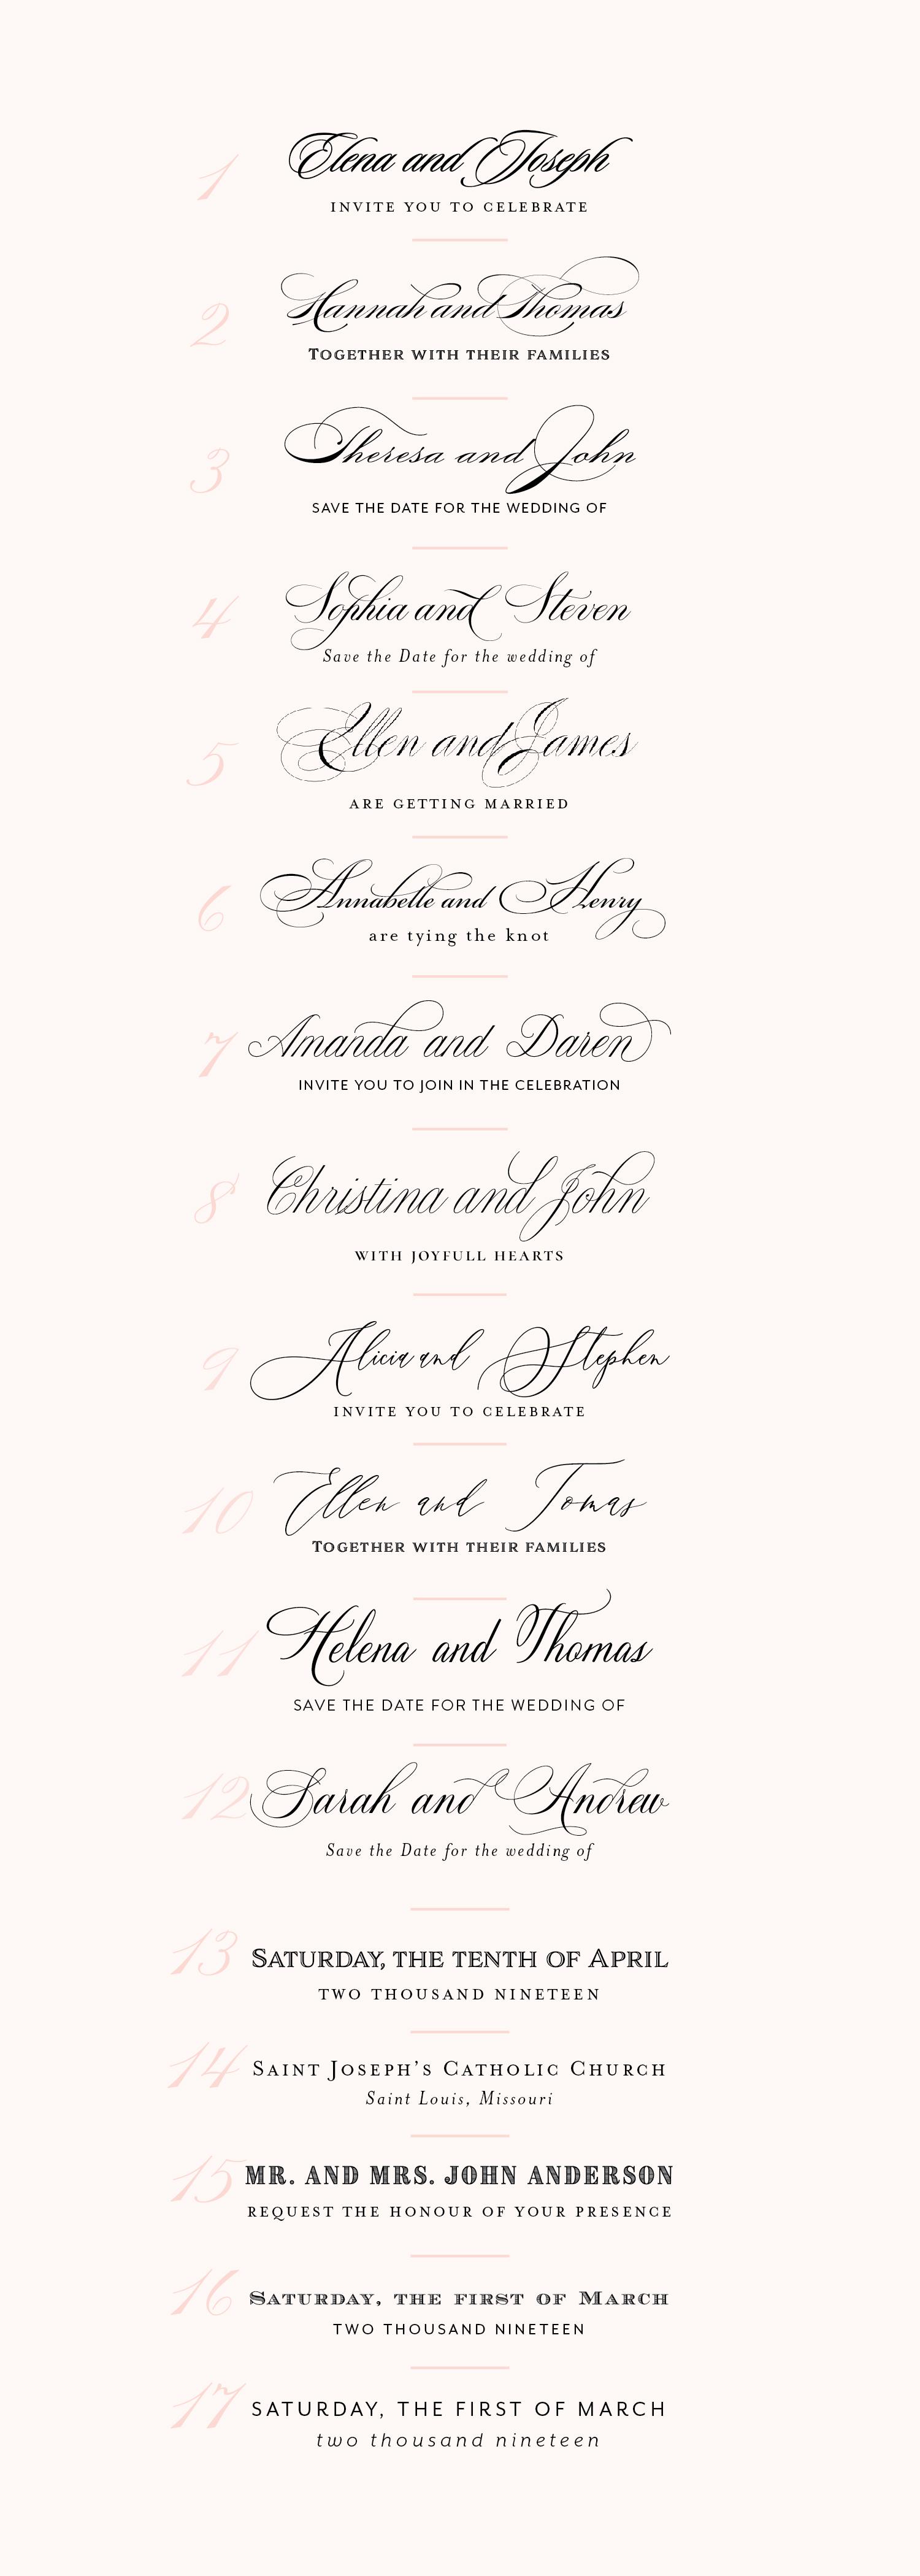 On Three Designs, St. Louis, MO, wedding font pairings